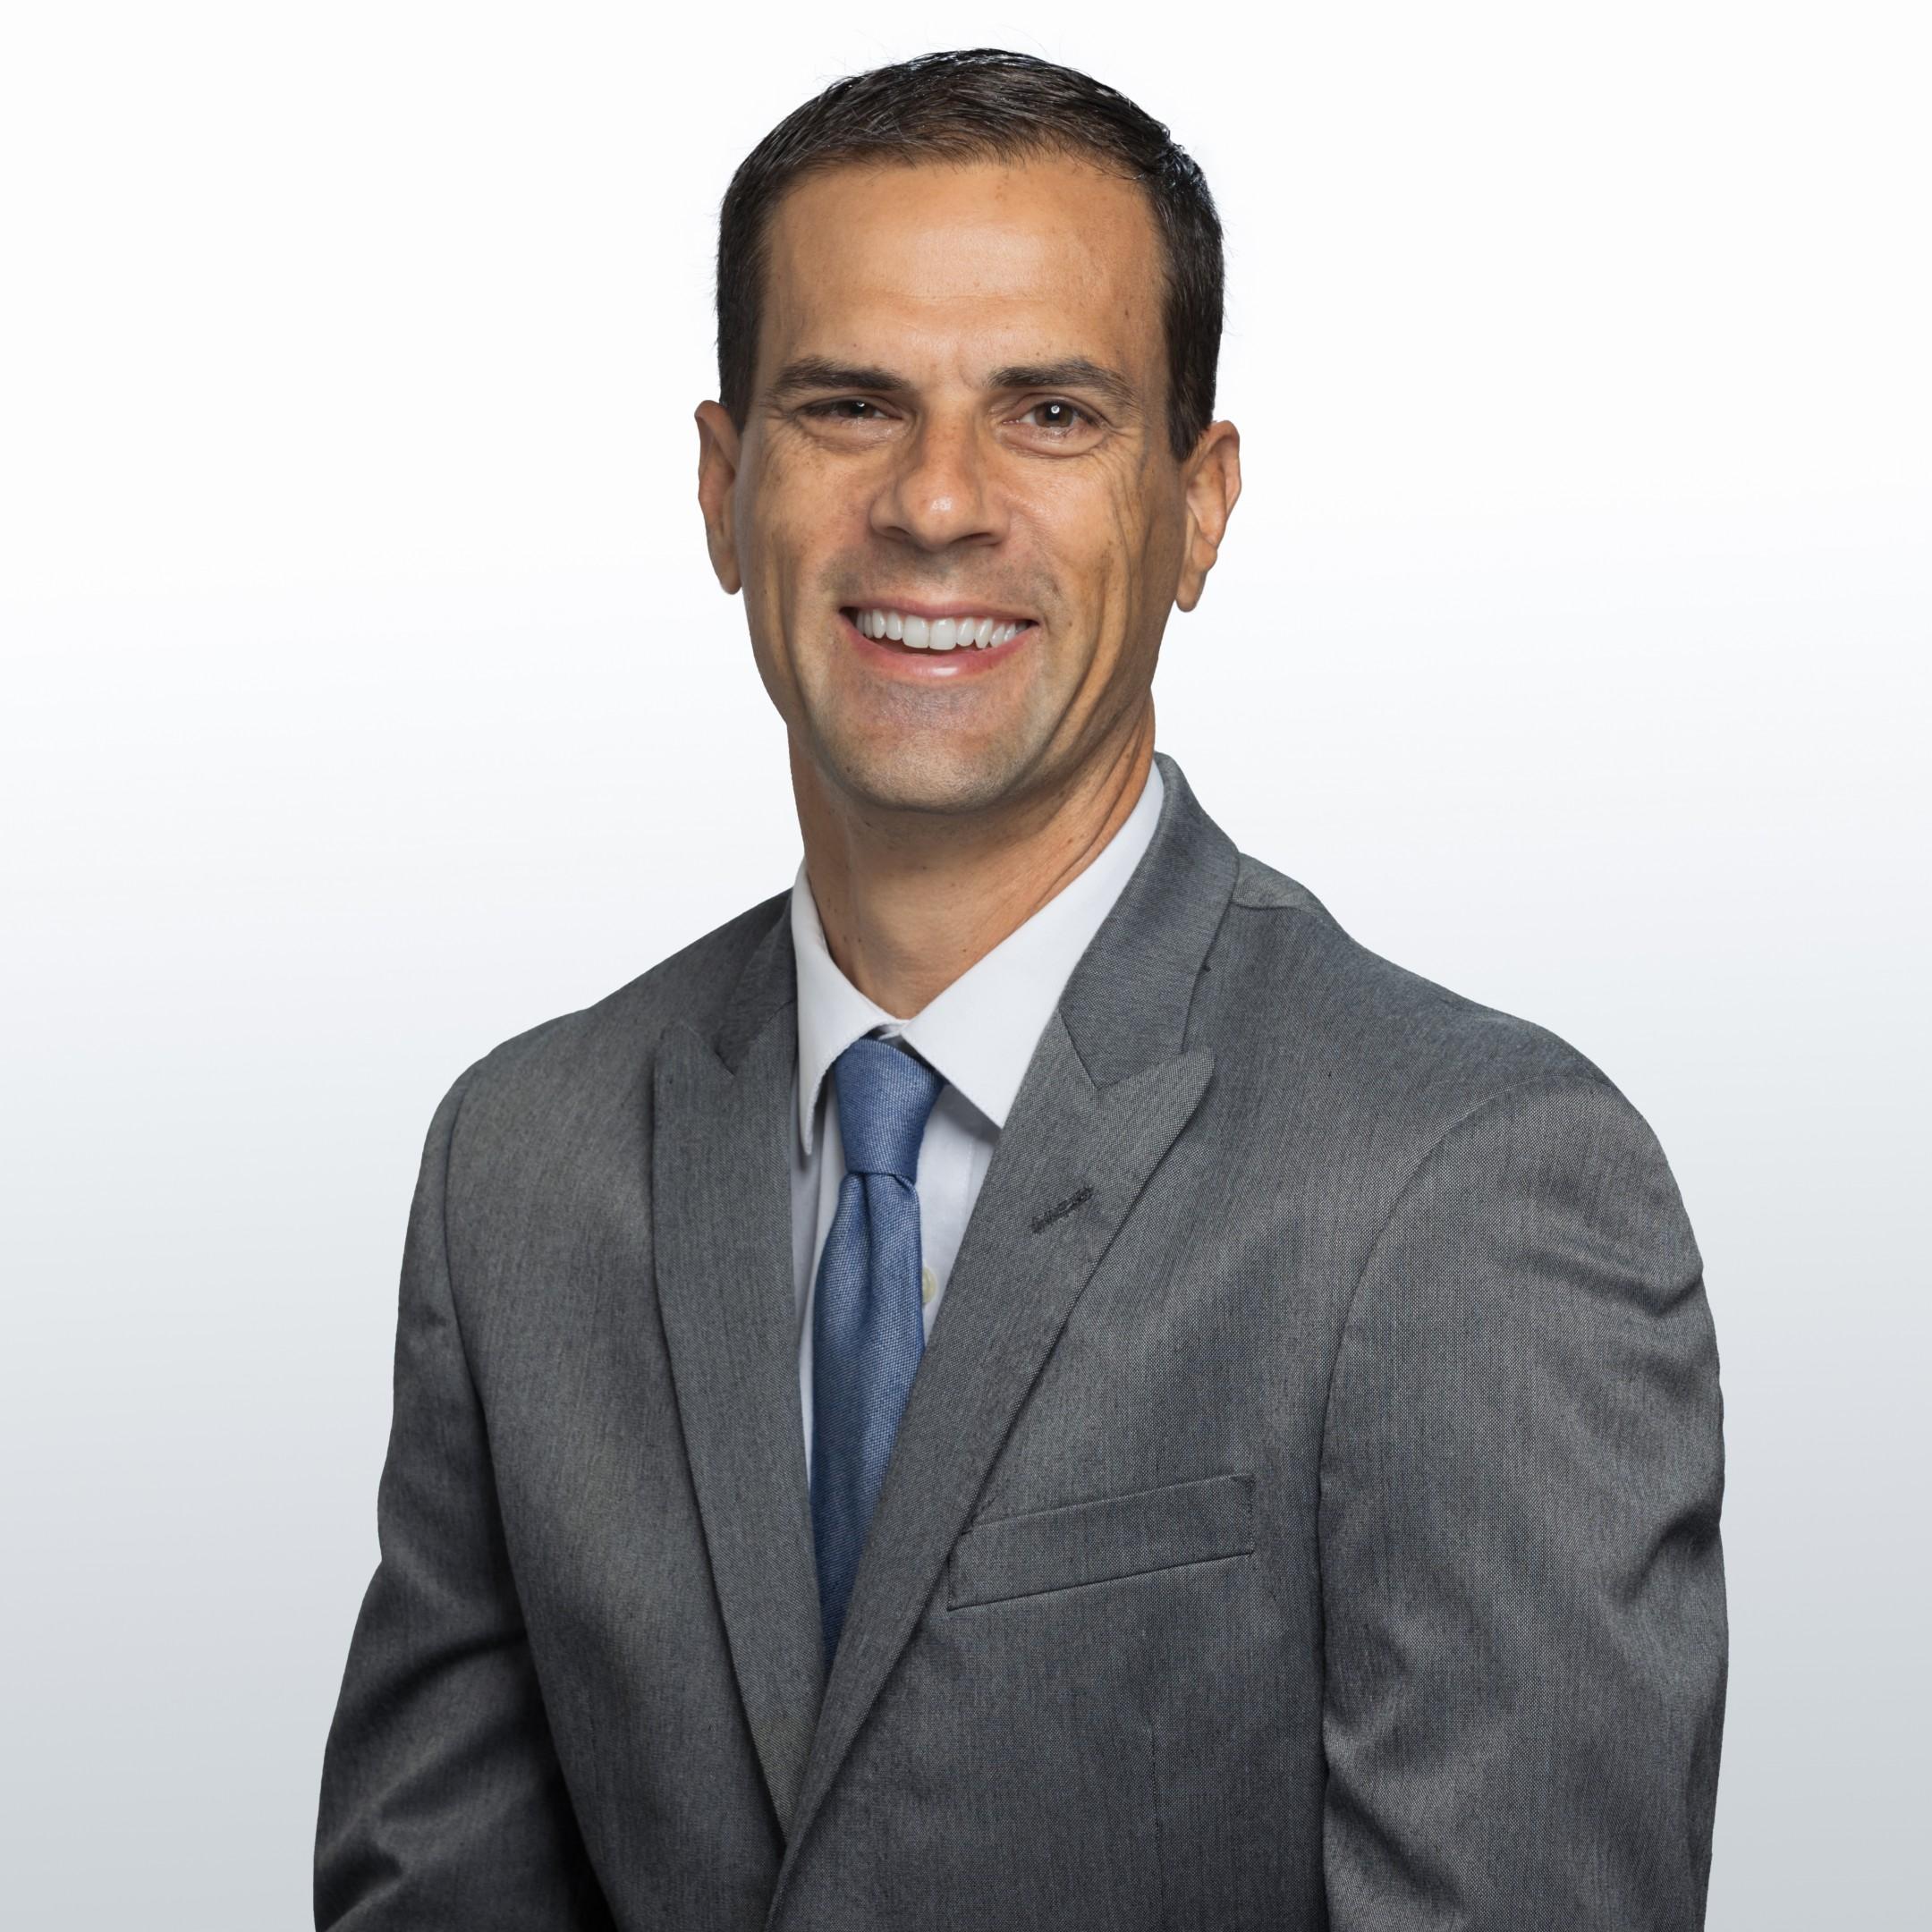 Ryan Dula